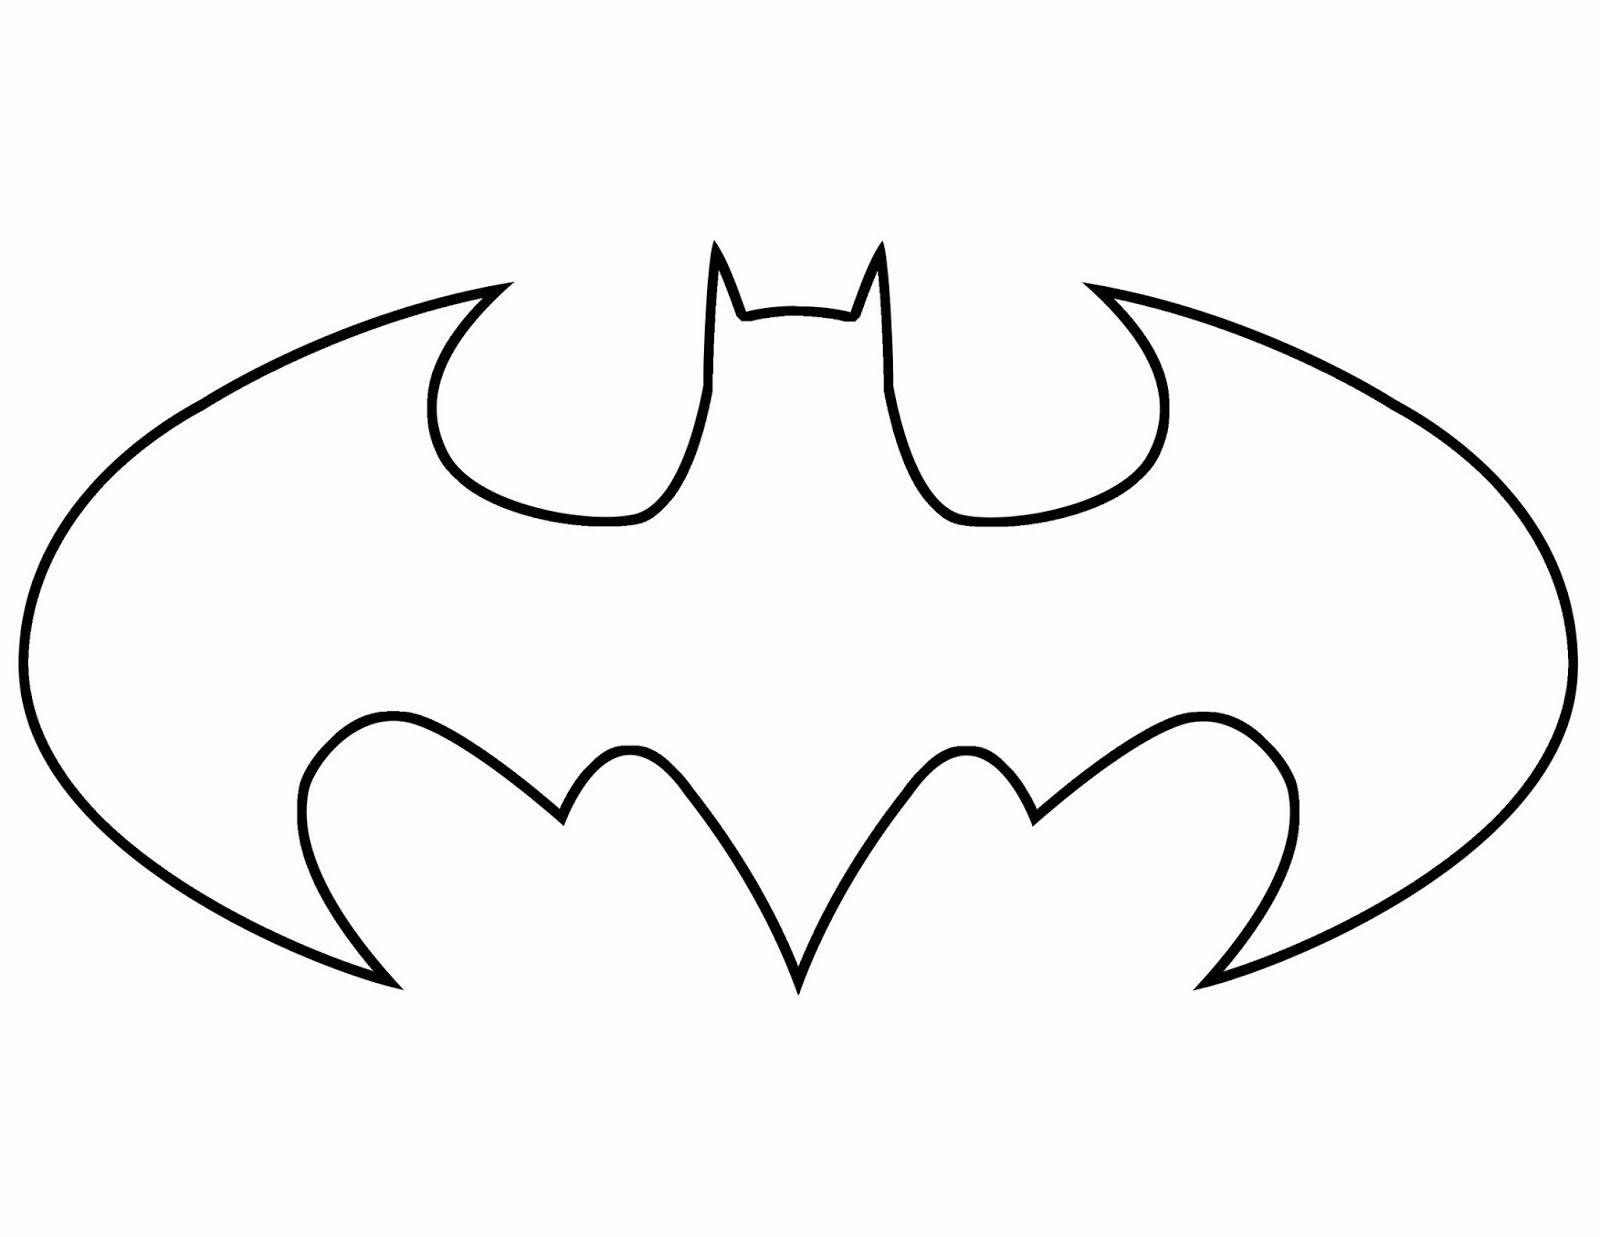 Spiderman Symbol Coloring Pages images | BATMAN COLORING